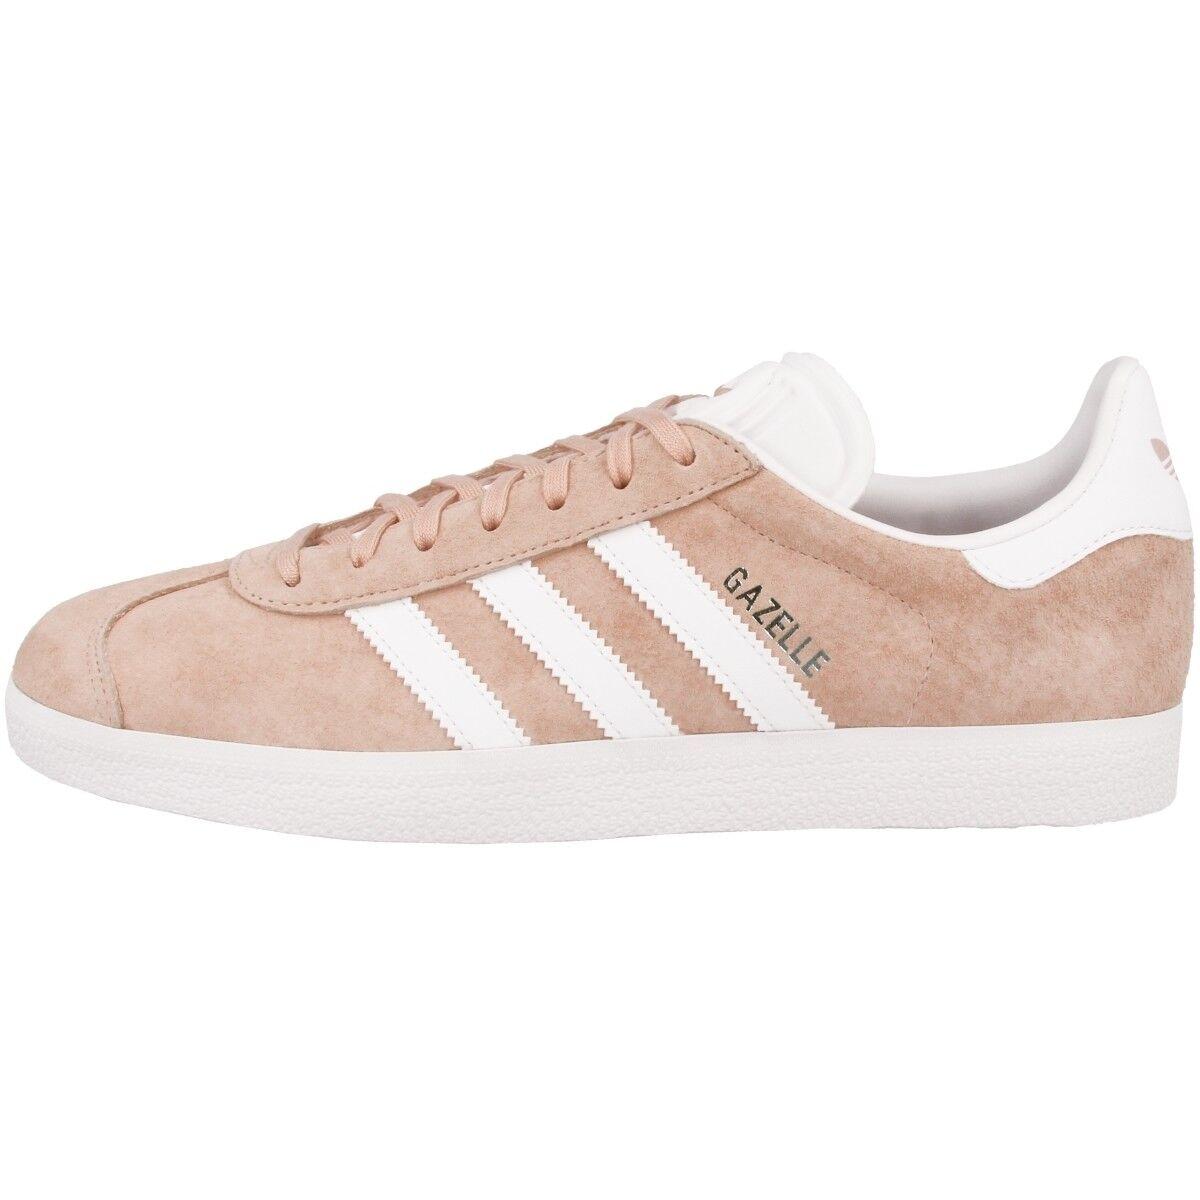 Adidas Gazelle Schuhe Freizeit Retro Freizeit Schuhe Sneaker Herren Sneakers pink Wei  BB5472 b0622f